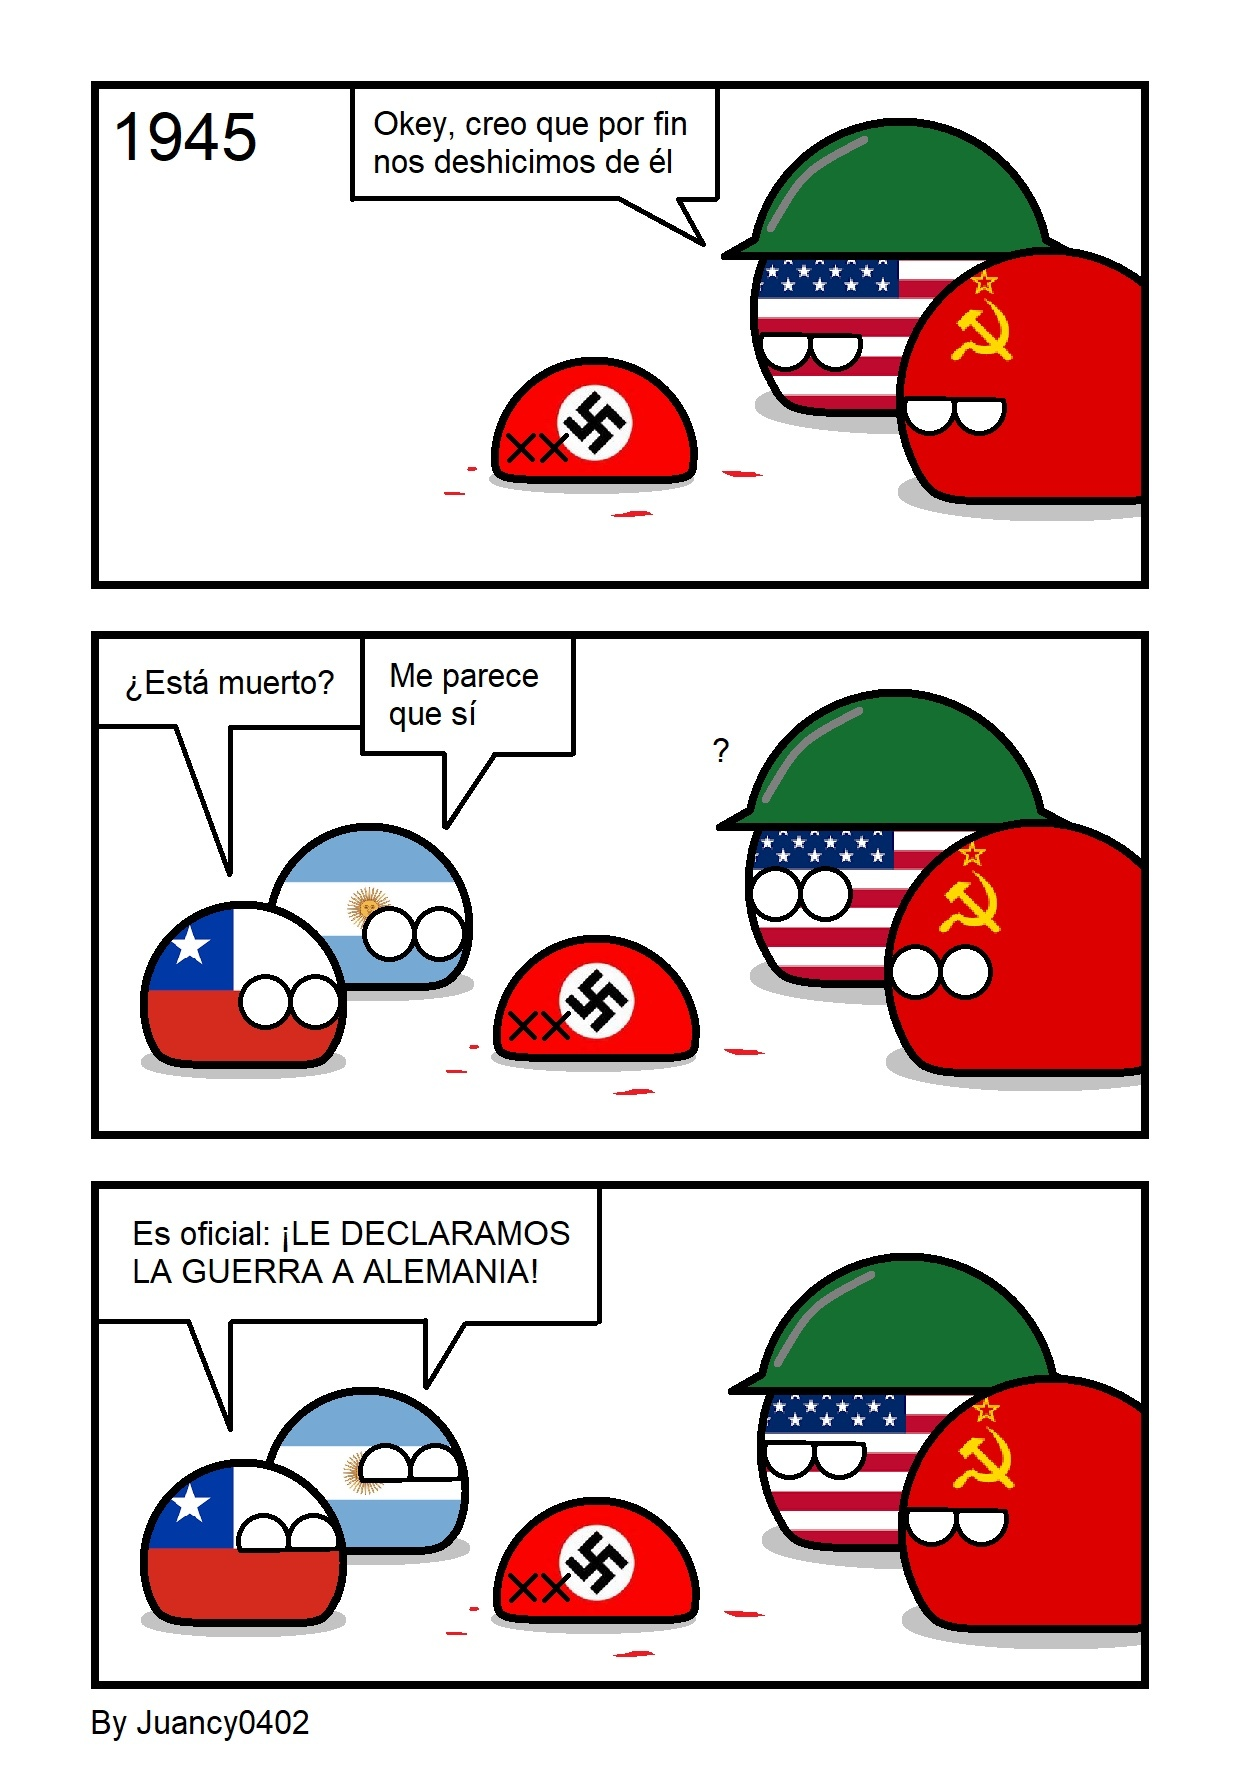 Toda Latinoamérica hizo lo mismo - meme